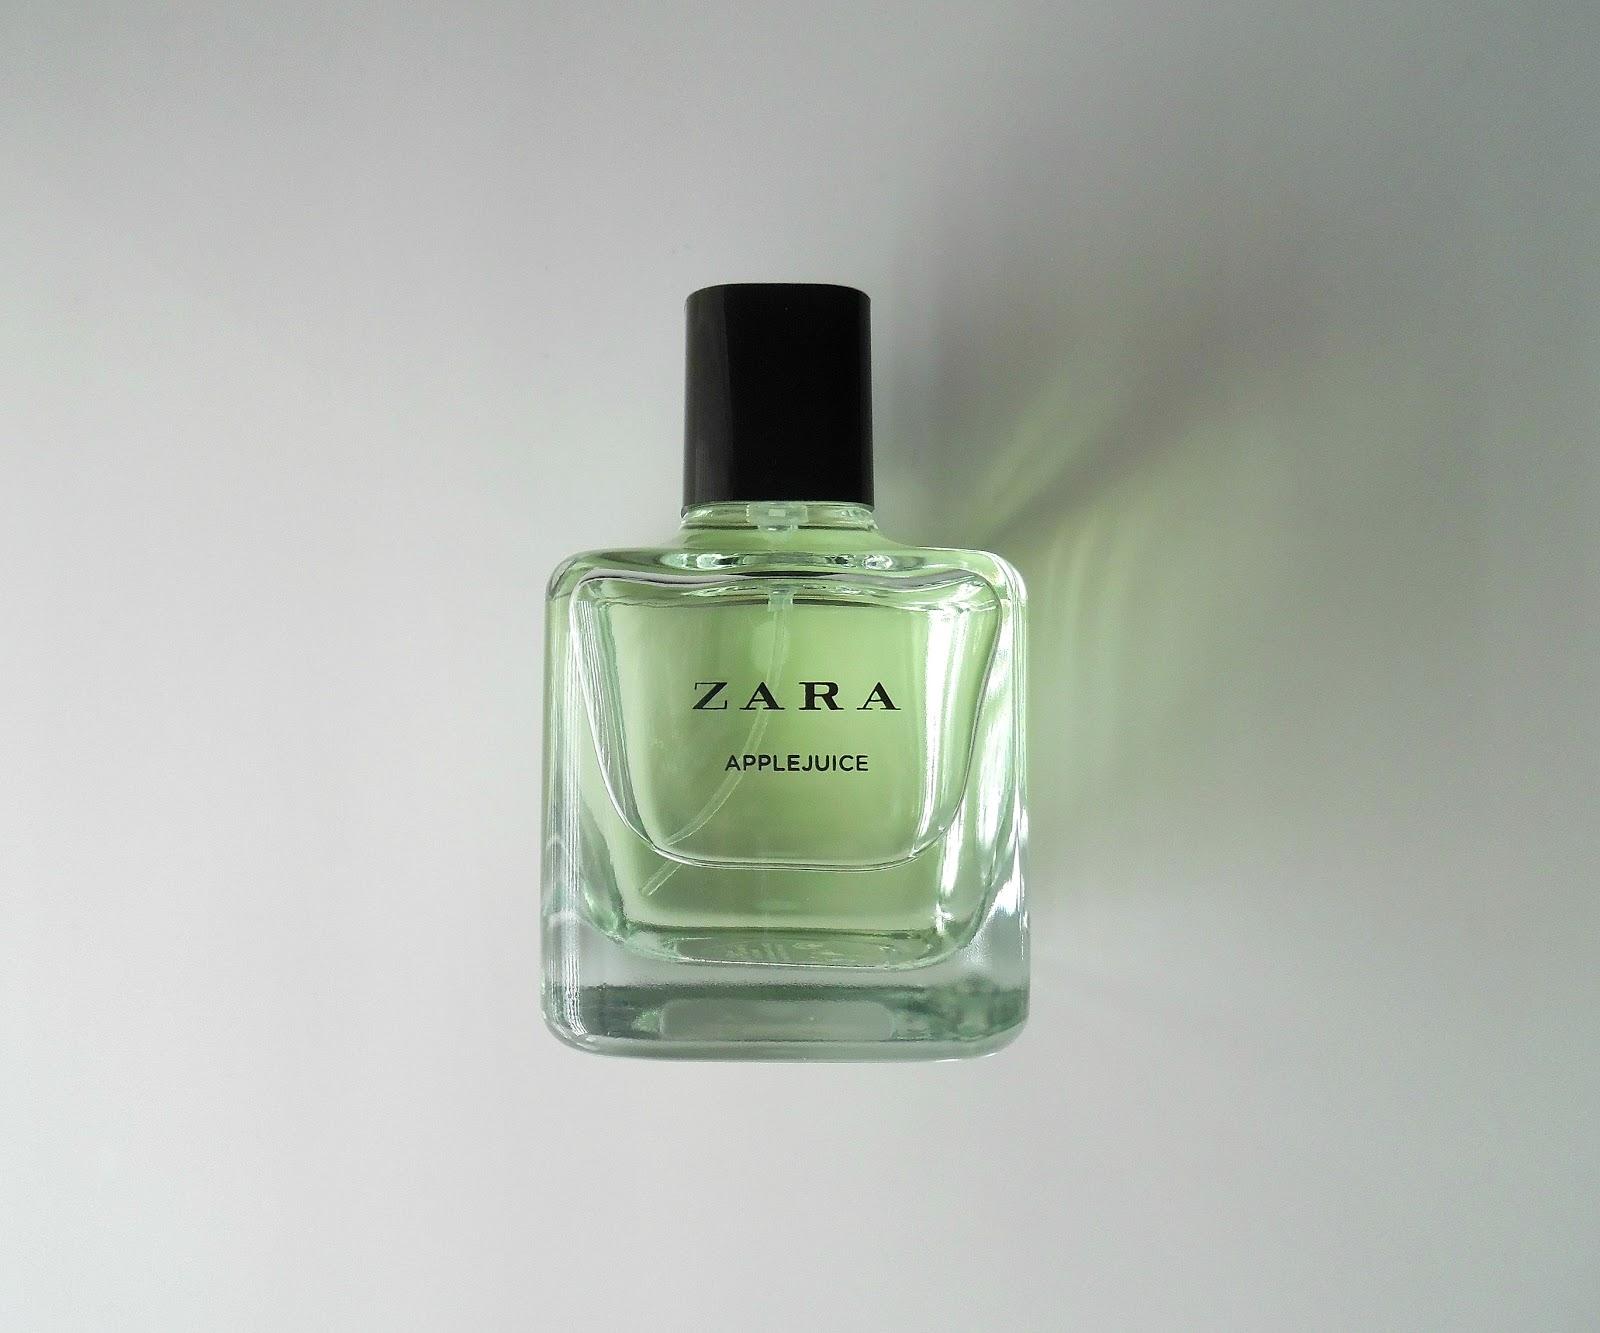 Dkny perfume be delicious